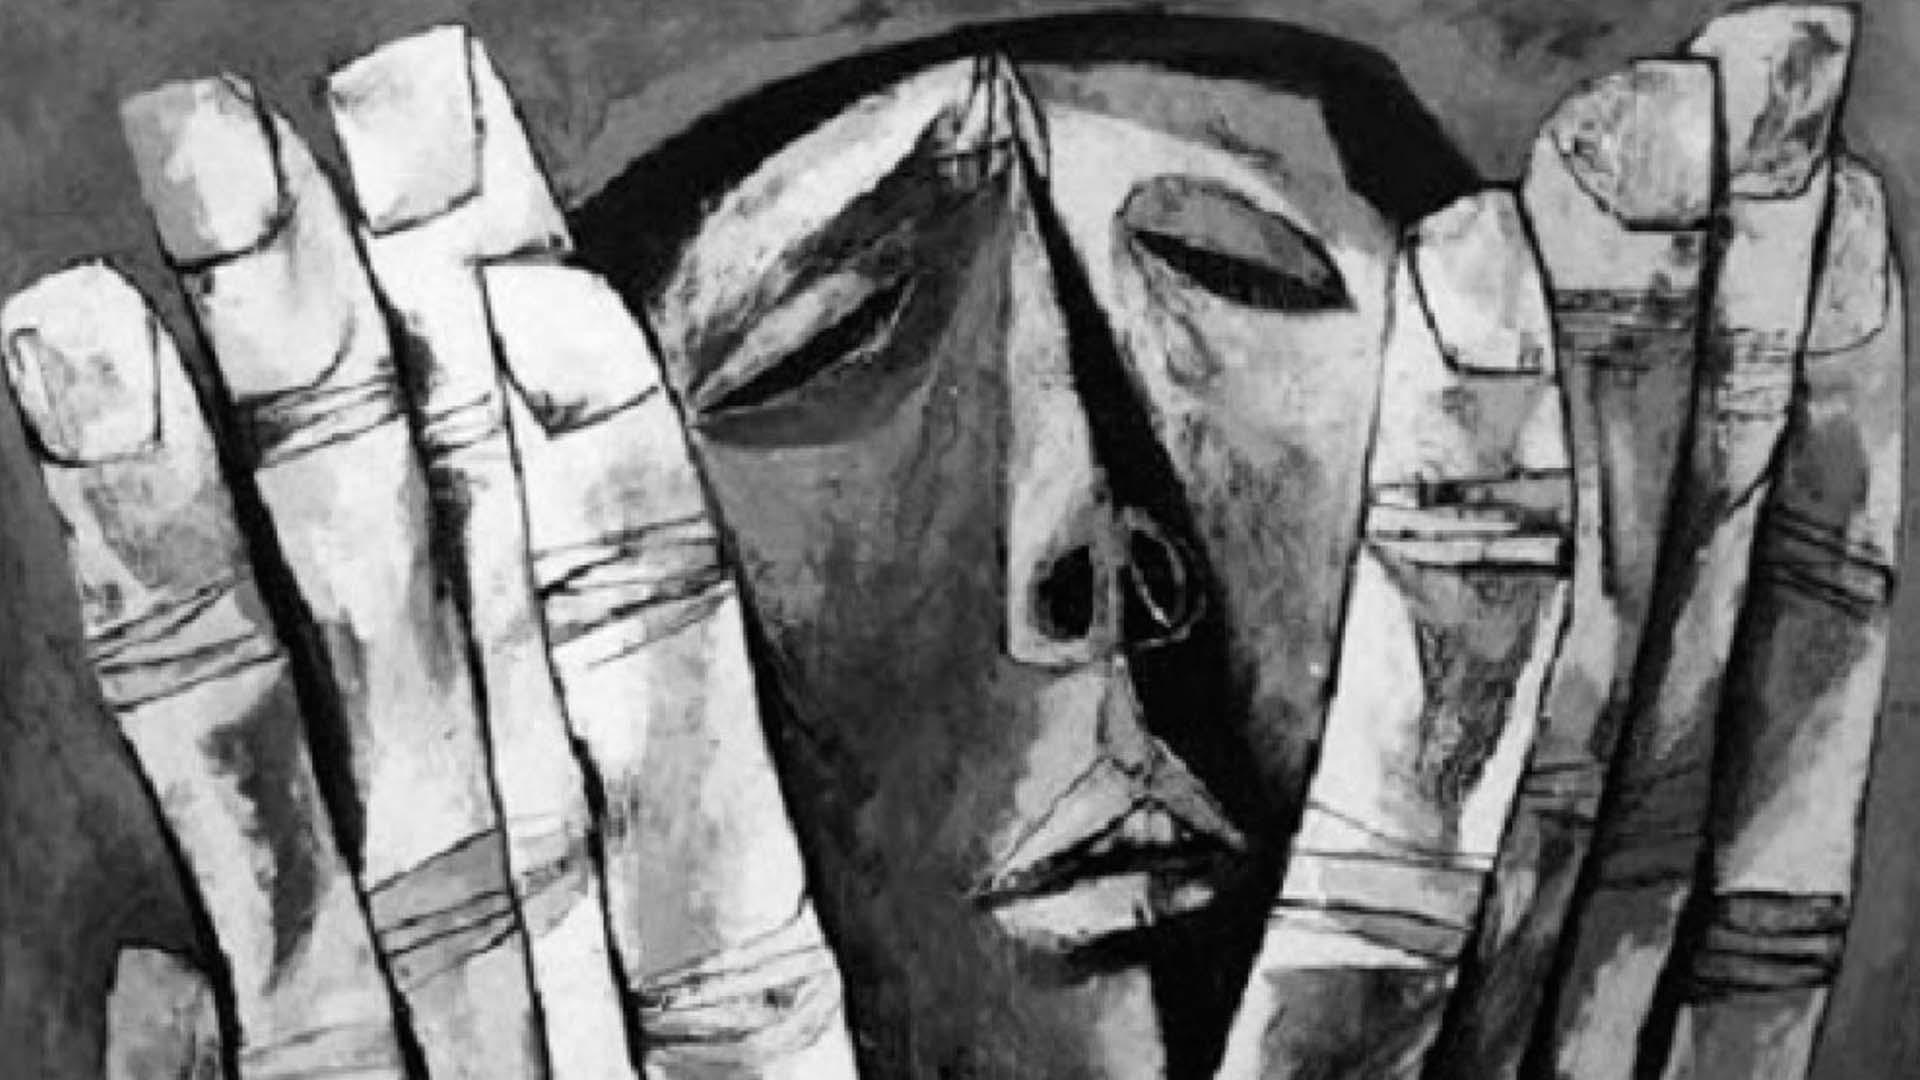 Lesa humanidad, por Laureano Márquez P.